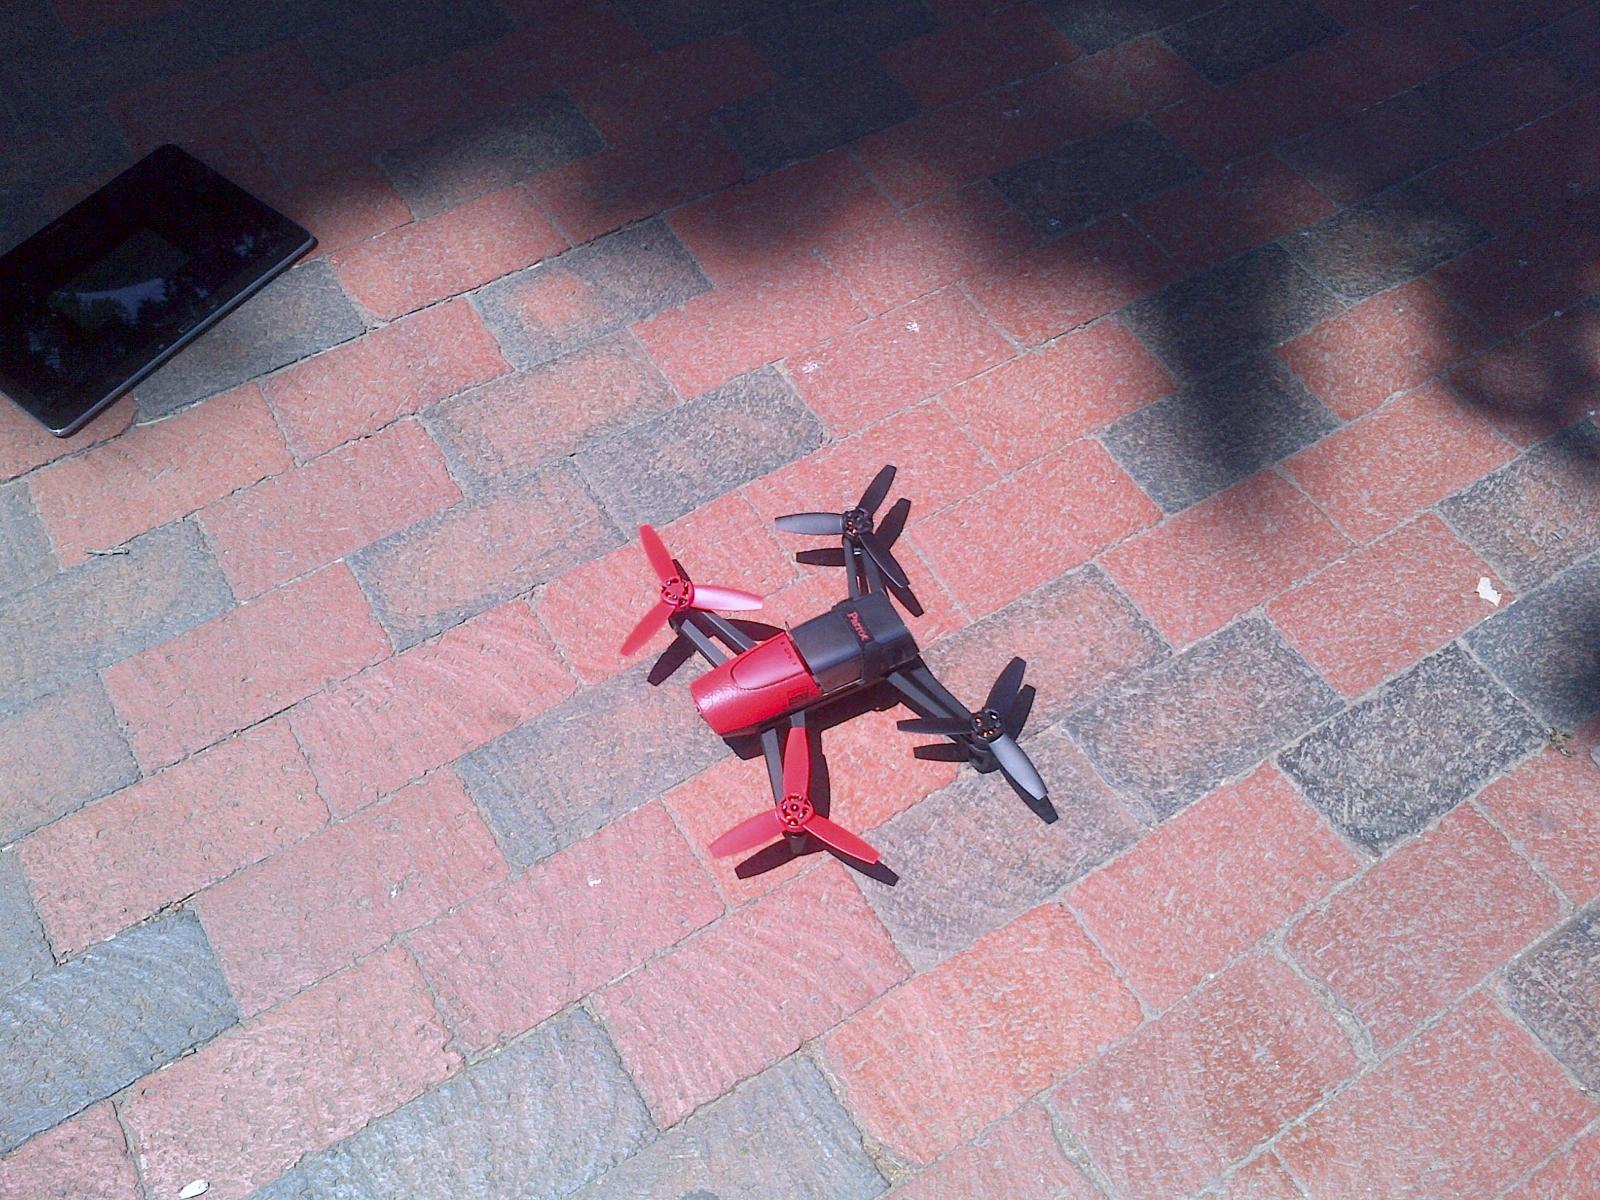 Plane drone surveillance FBI US